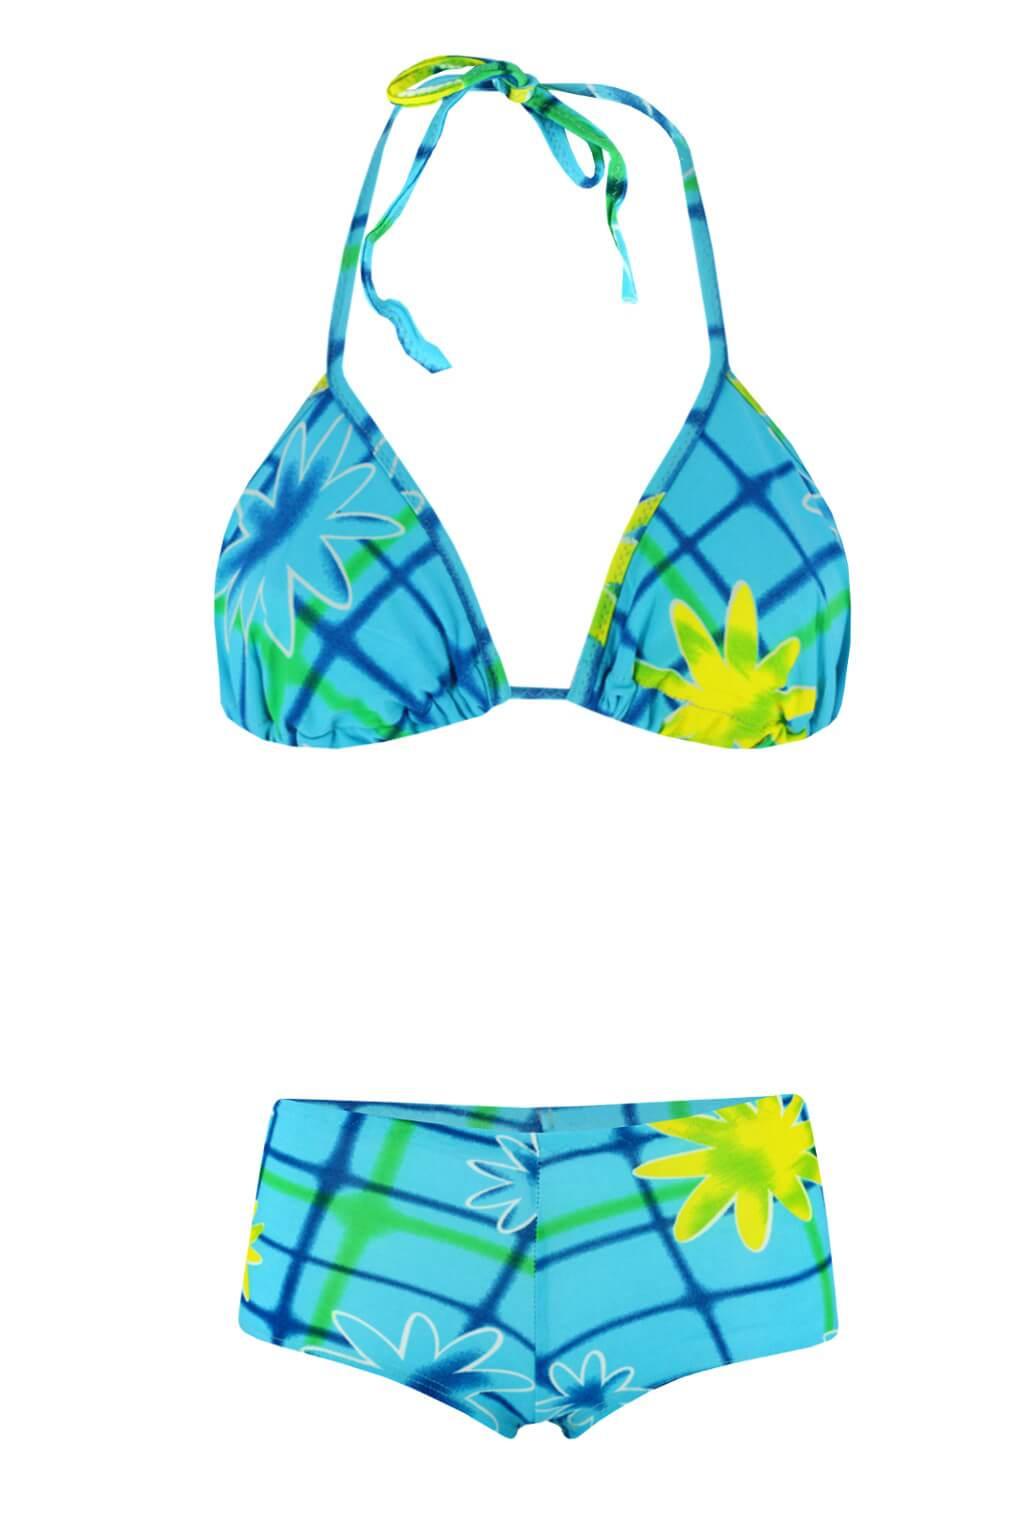 Aqua B plavky se sukénkou S modrá